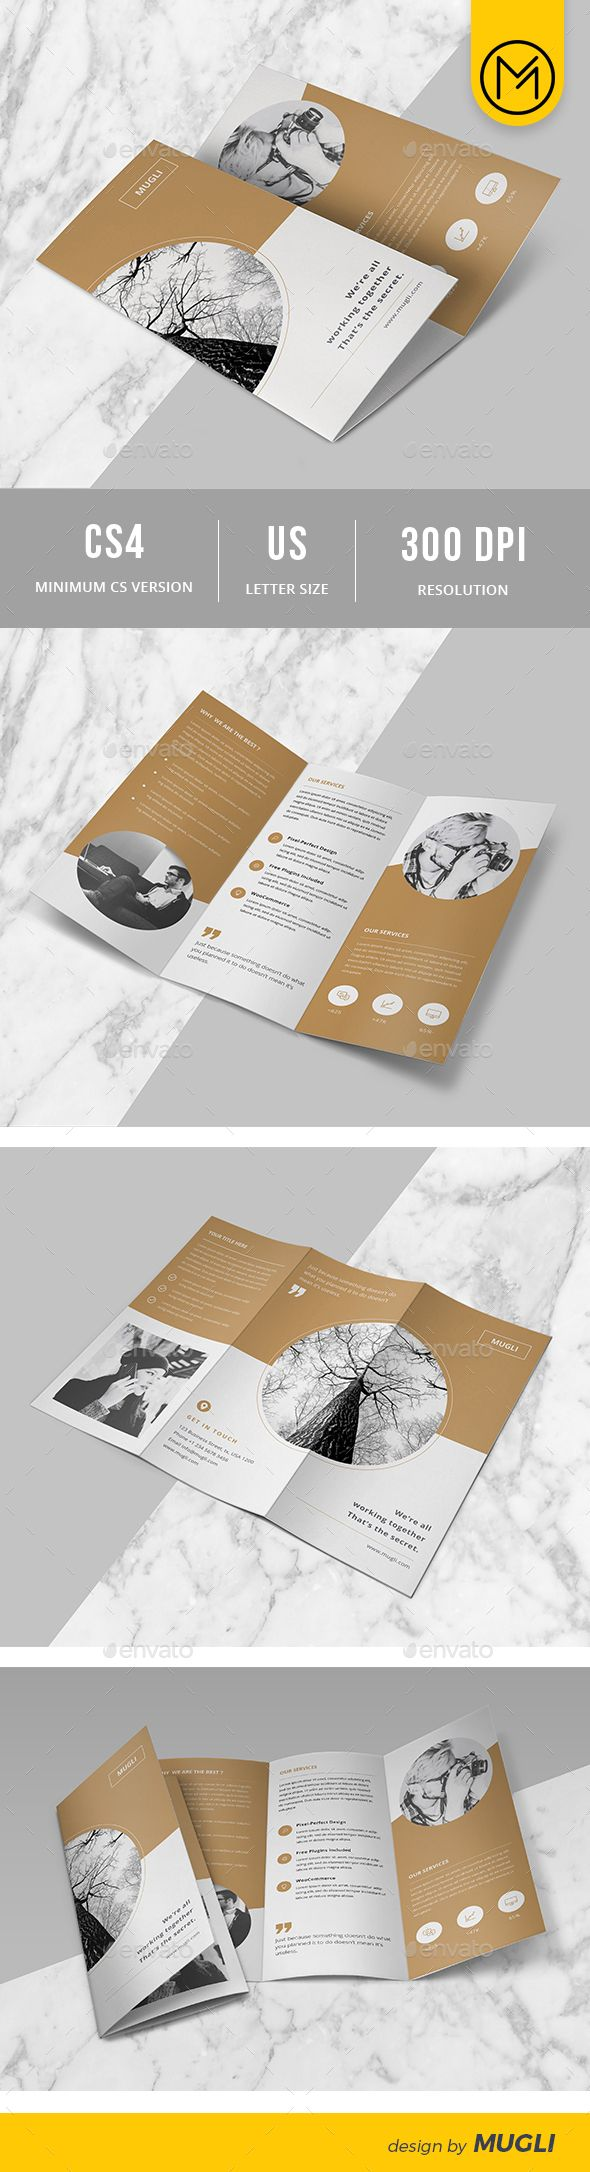 Trifold Brochure | Pinterest | Tríptico, Volantes y Colegios